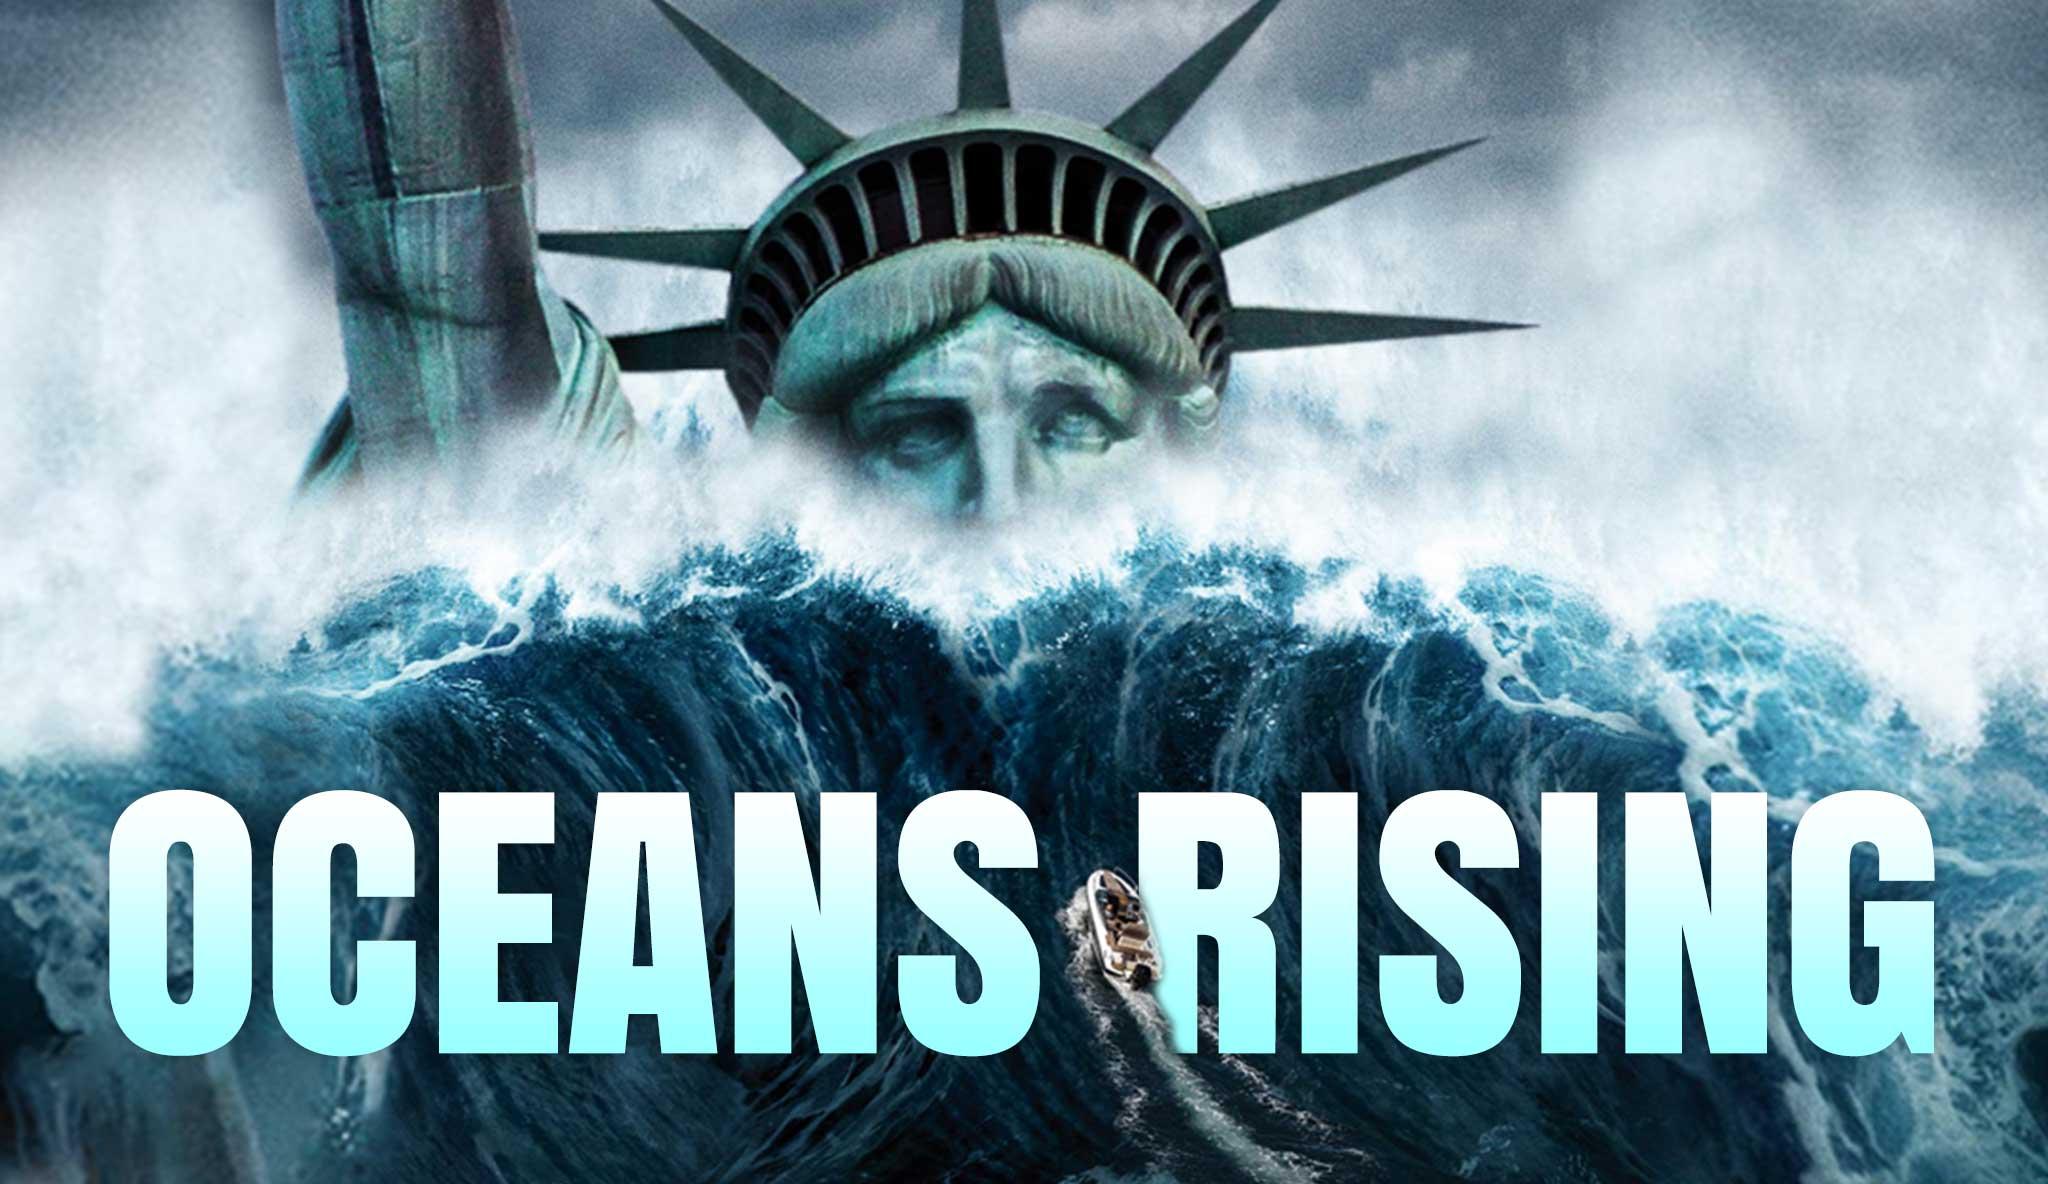 oceans-rising\header.jpg